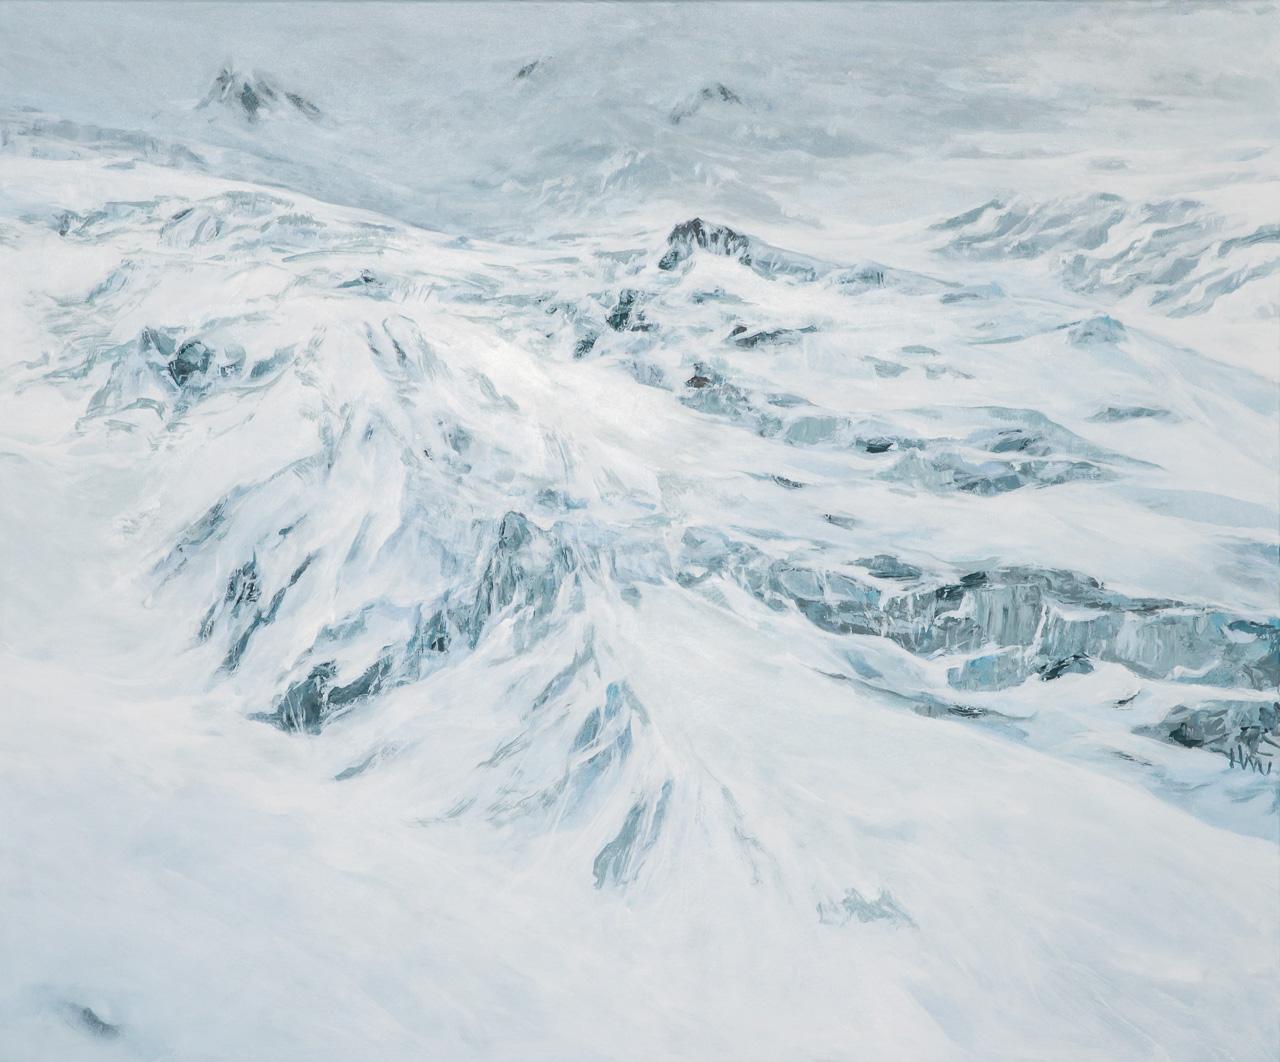 Gletscherland II Langfluh Saas-Fee